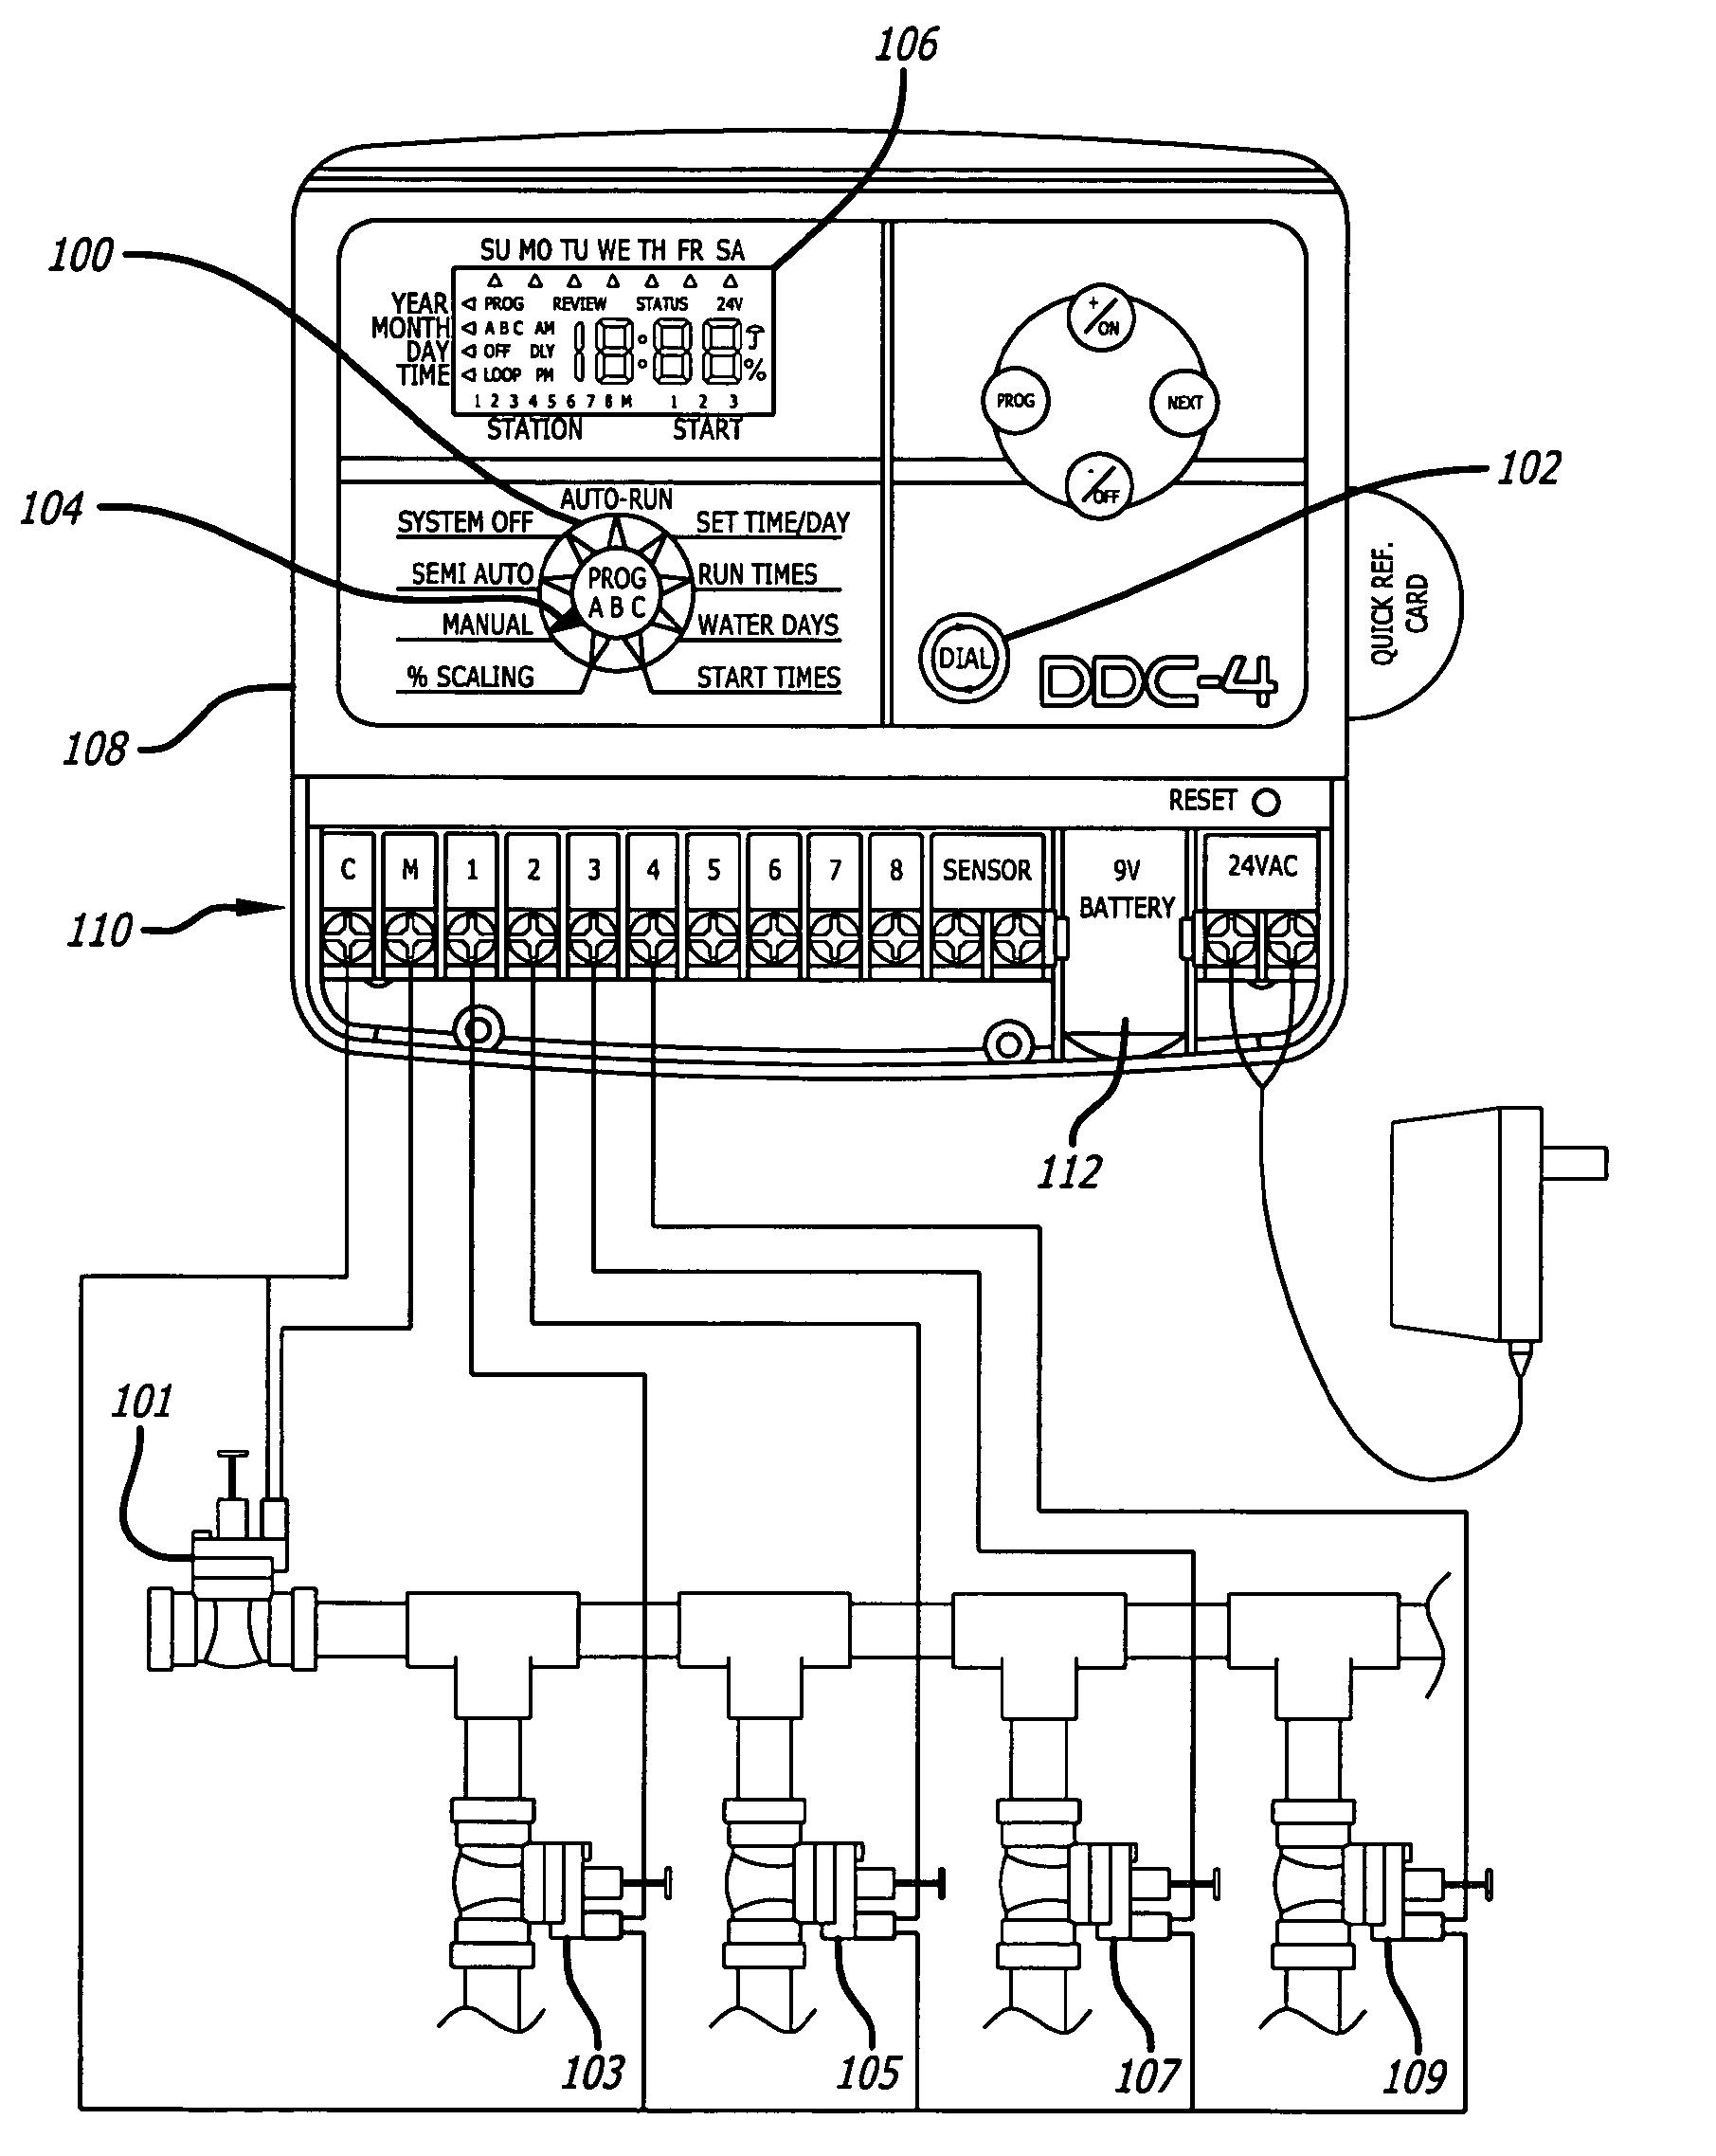 Rainbird controller wiring diagram free download wiring diagrams sears wiring diagrams